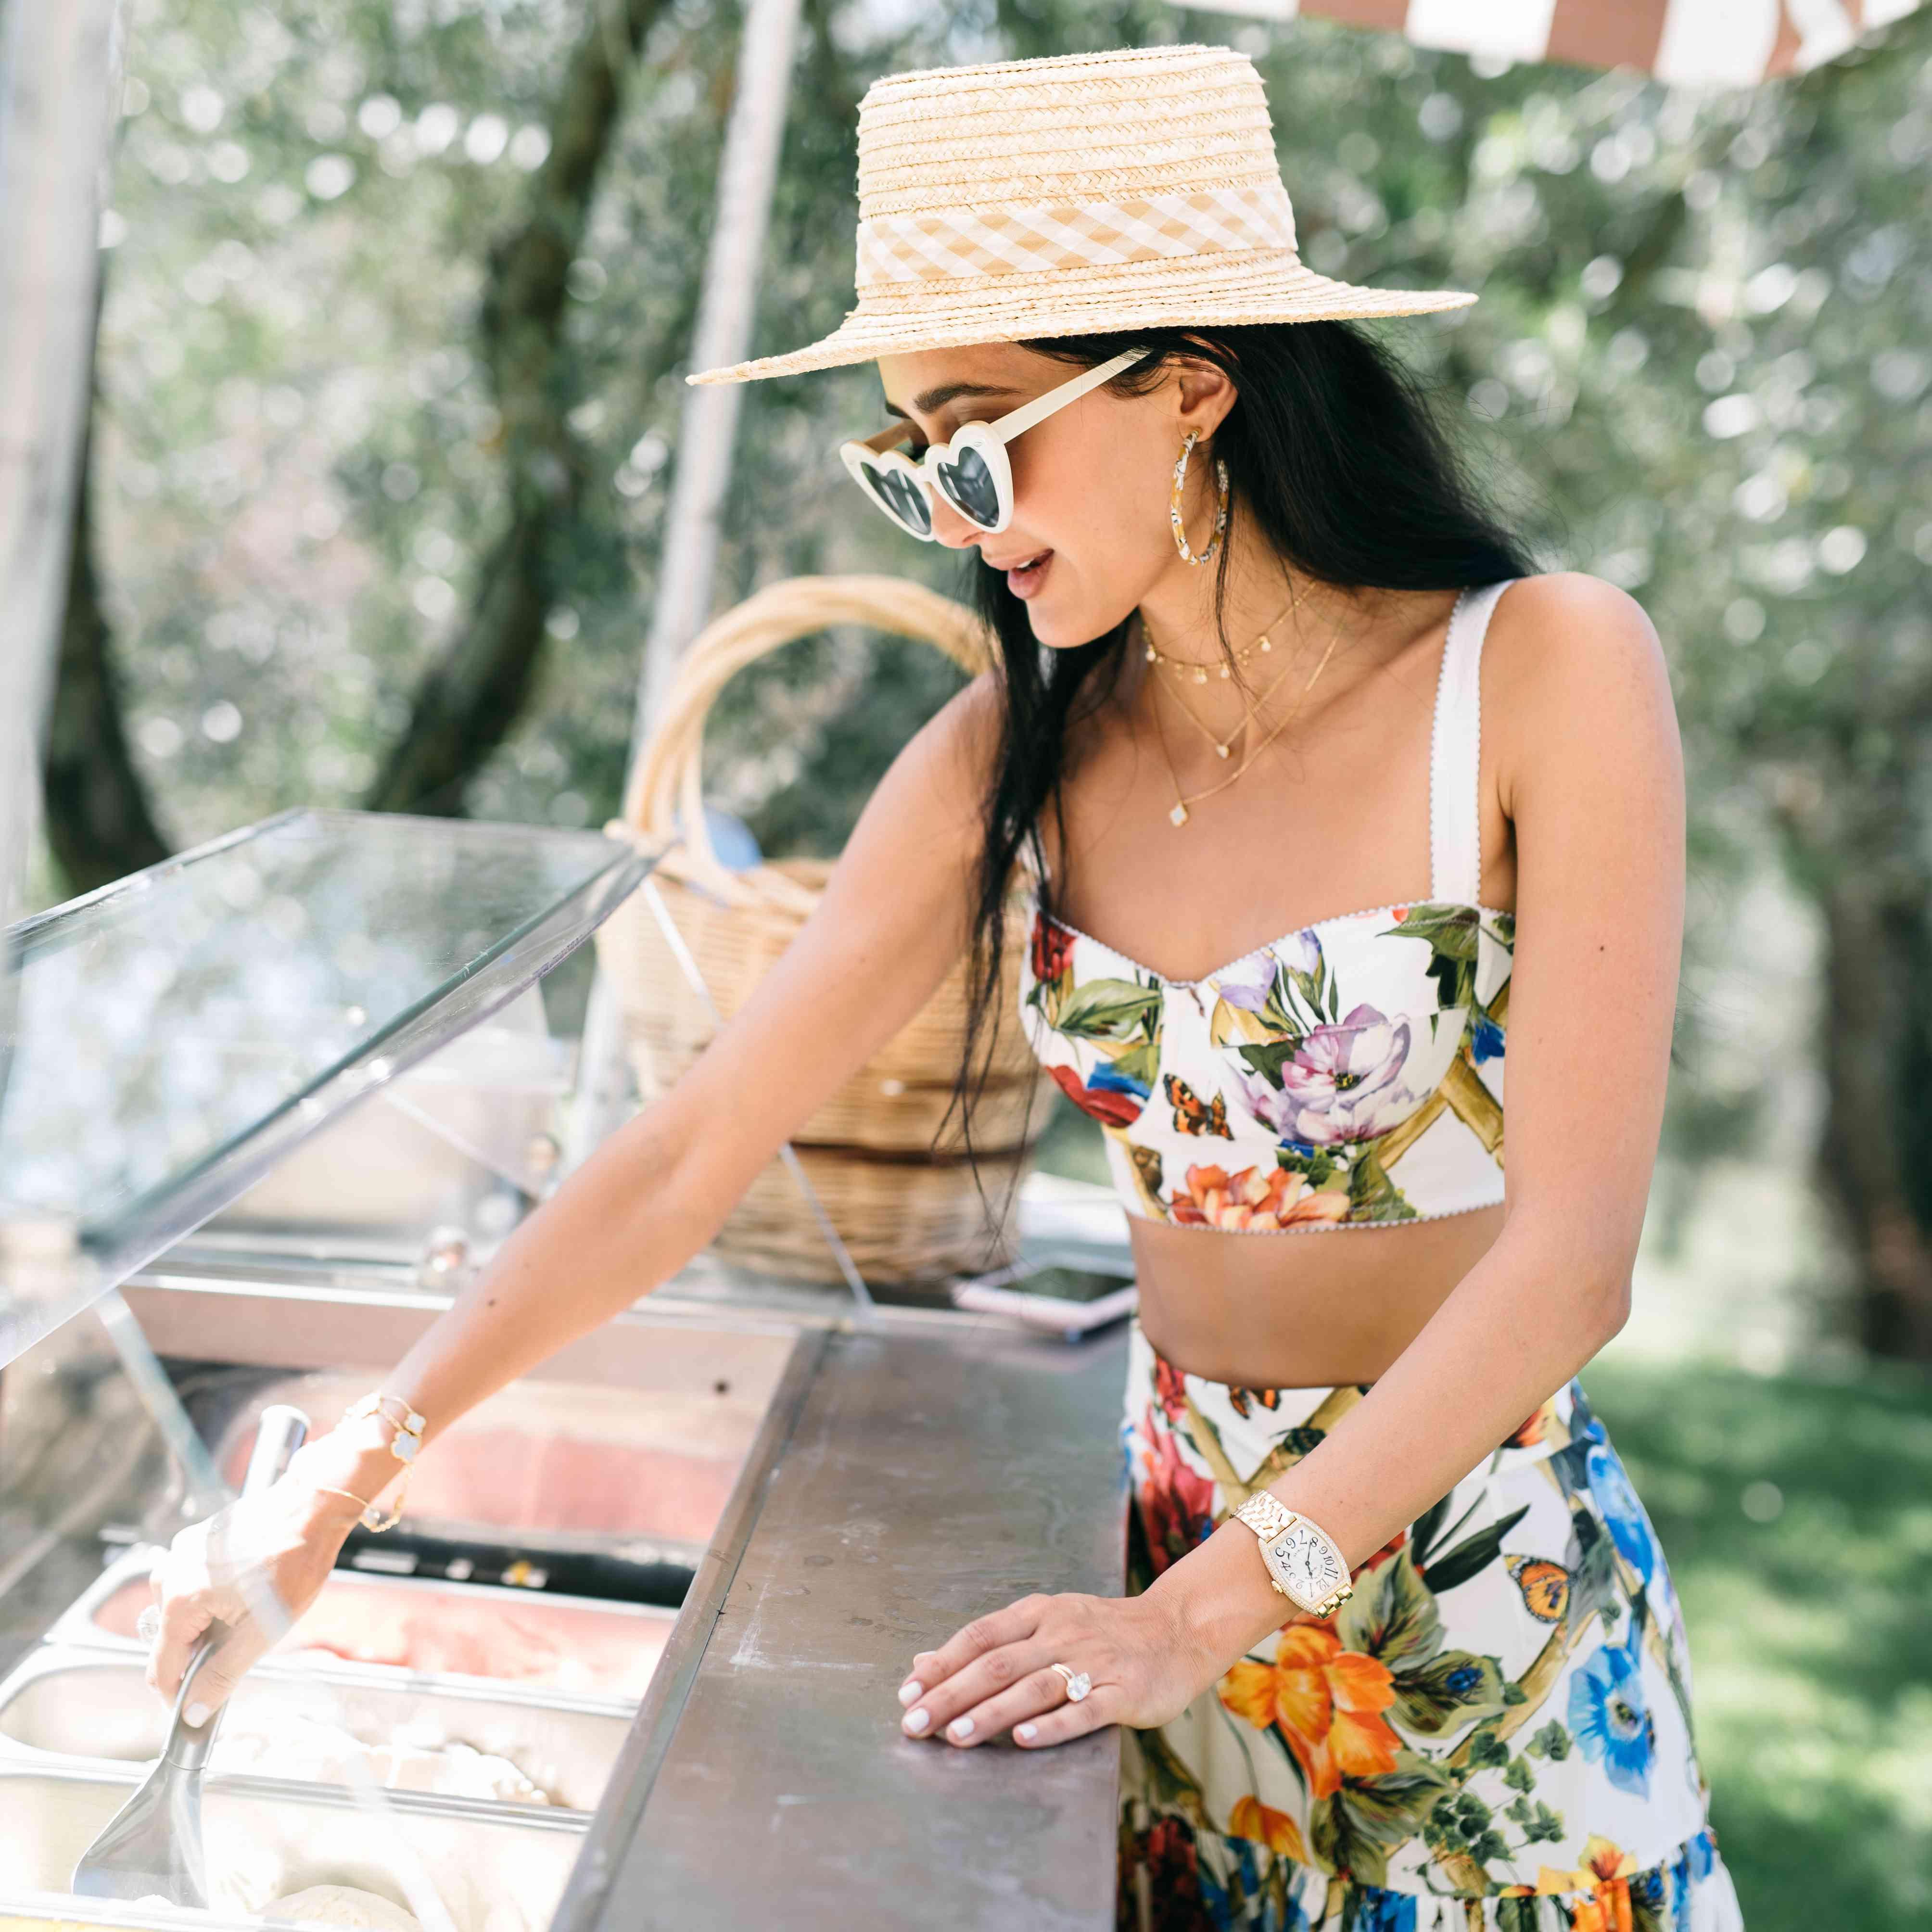 Girl at a gelato bar